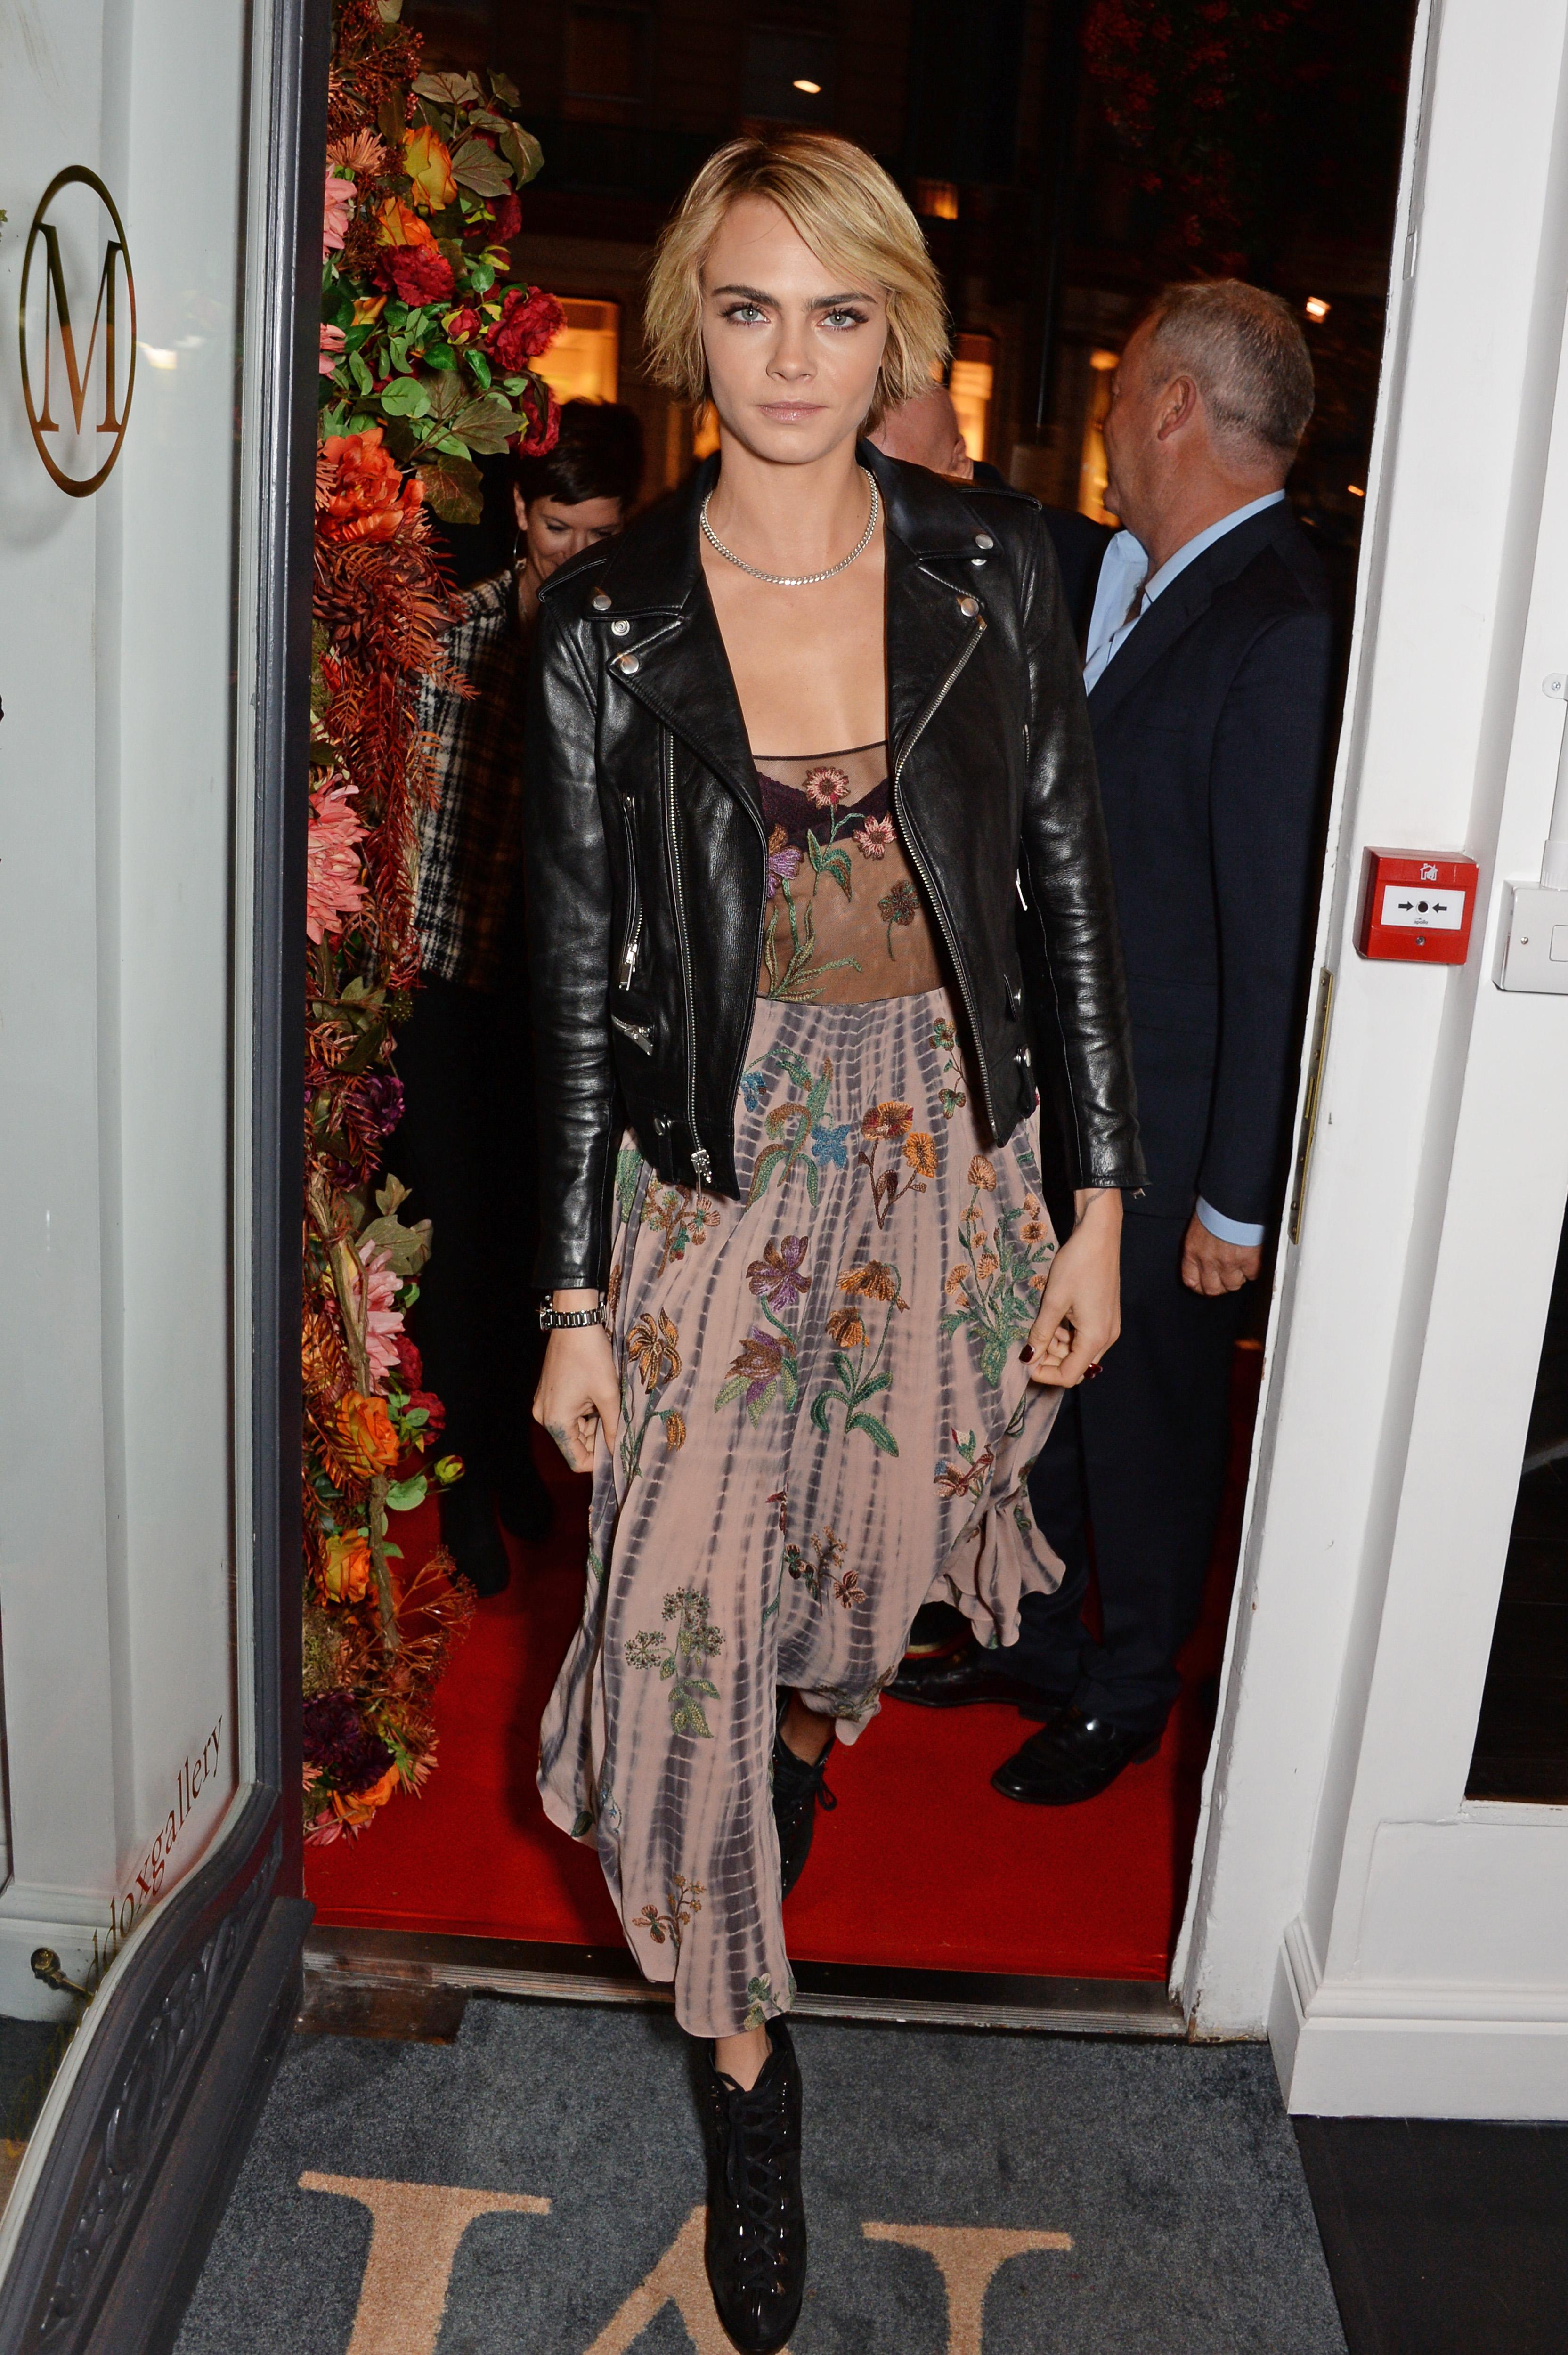 Cara Delevingne maravilhosa de vestido longo e jaqueta de couro.